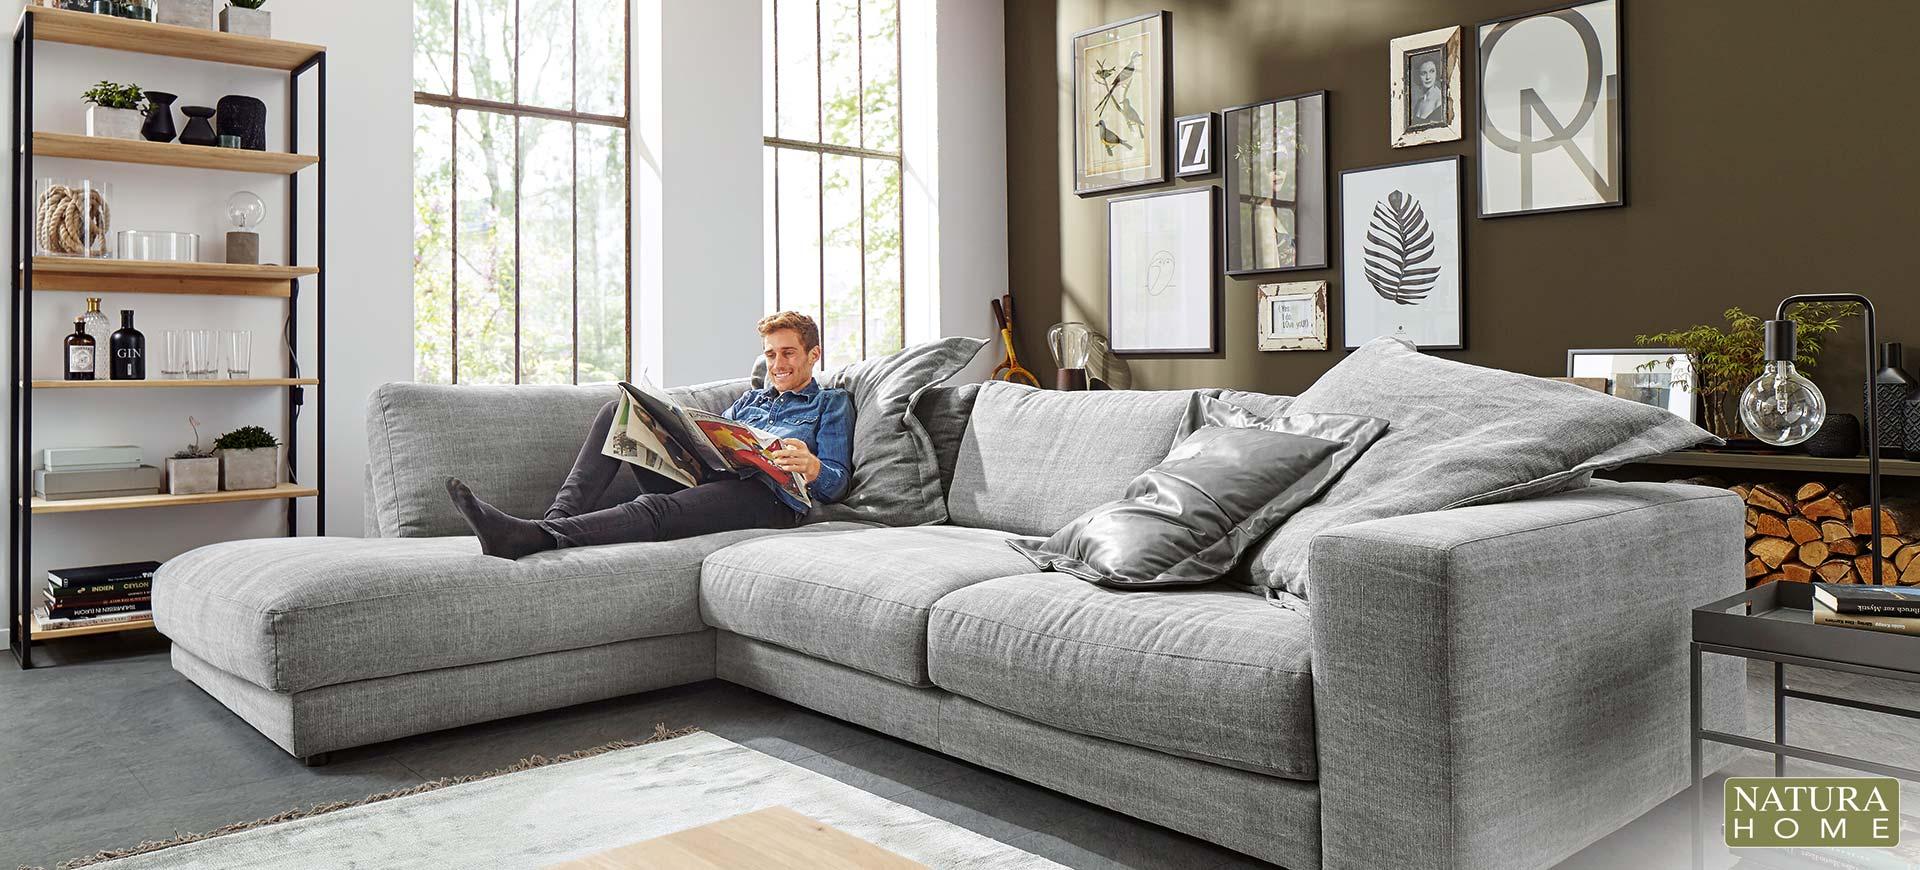 m bel u k chen reinecke m bel und k chen in delmenhorst nahe bremen. Black Bedroom Furniture Sets. Home Design Ideas